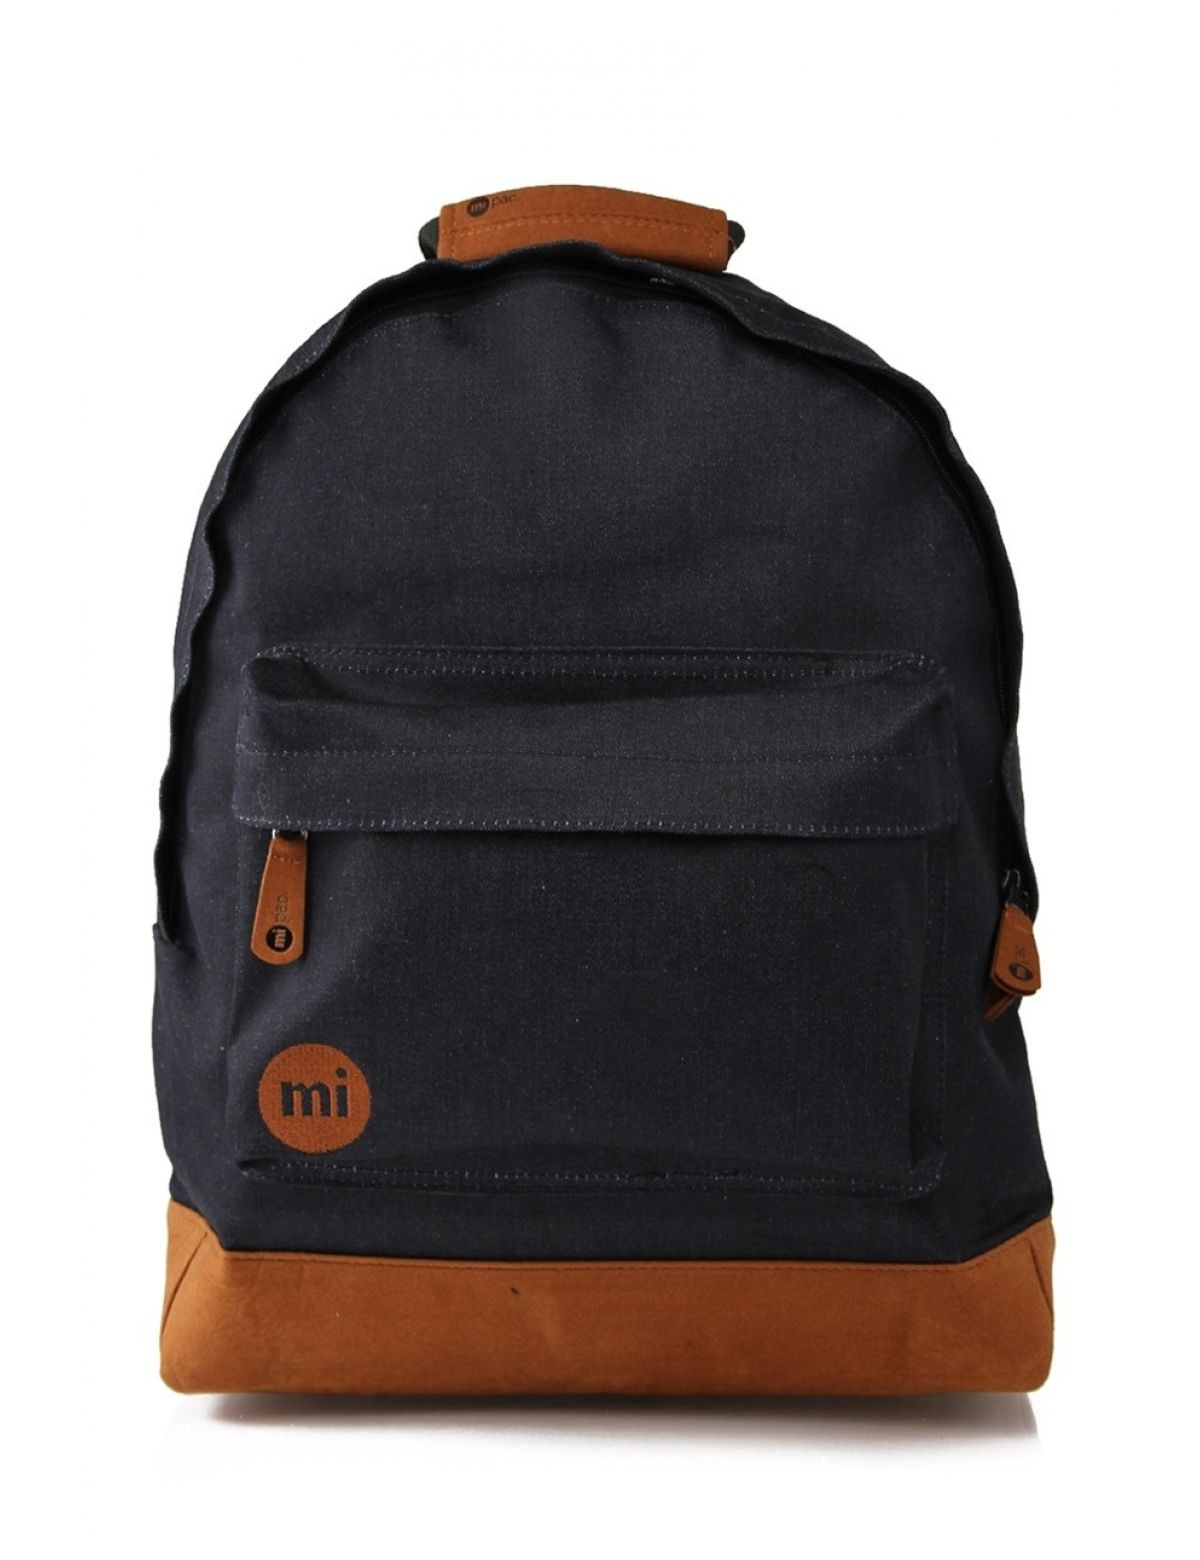 Gold | Mi Pac | back pack | Backpacks, Rucksack backpack